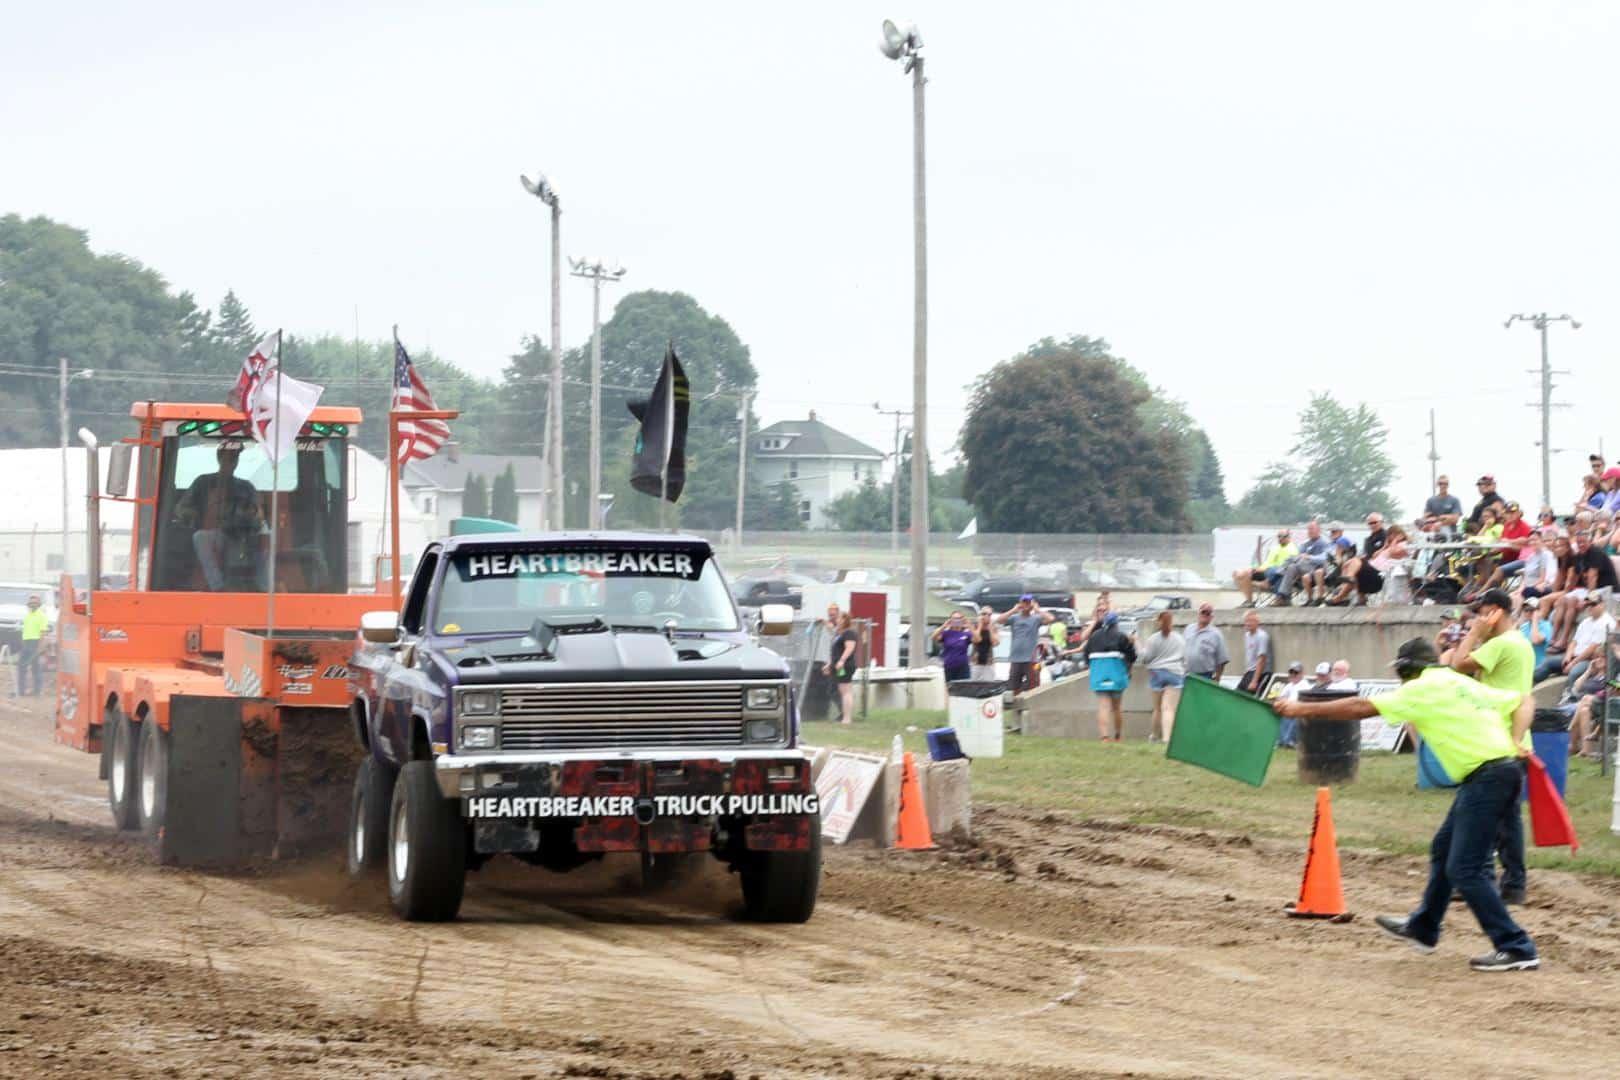 Heartbreaker Truck Pulling at Dodge County Fair